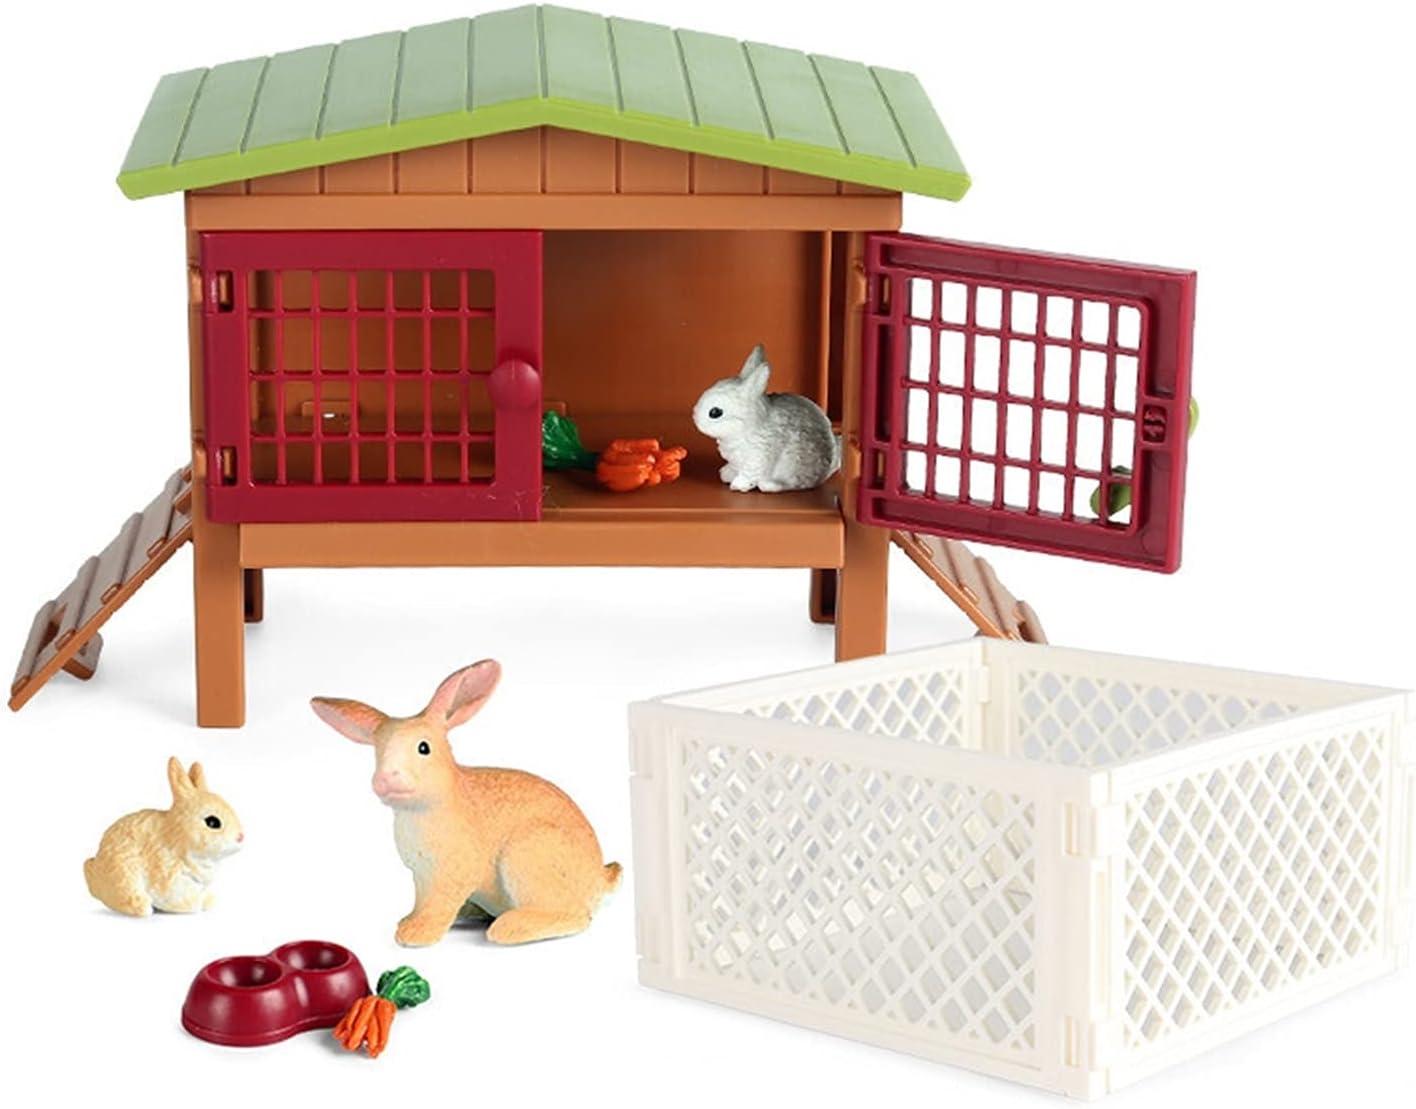 DUANCUICUIZ Model Simulation Farm Zoo Dog Farmer Chicken Animal Max 49% OFF Ranking TOP14